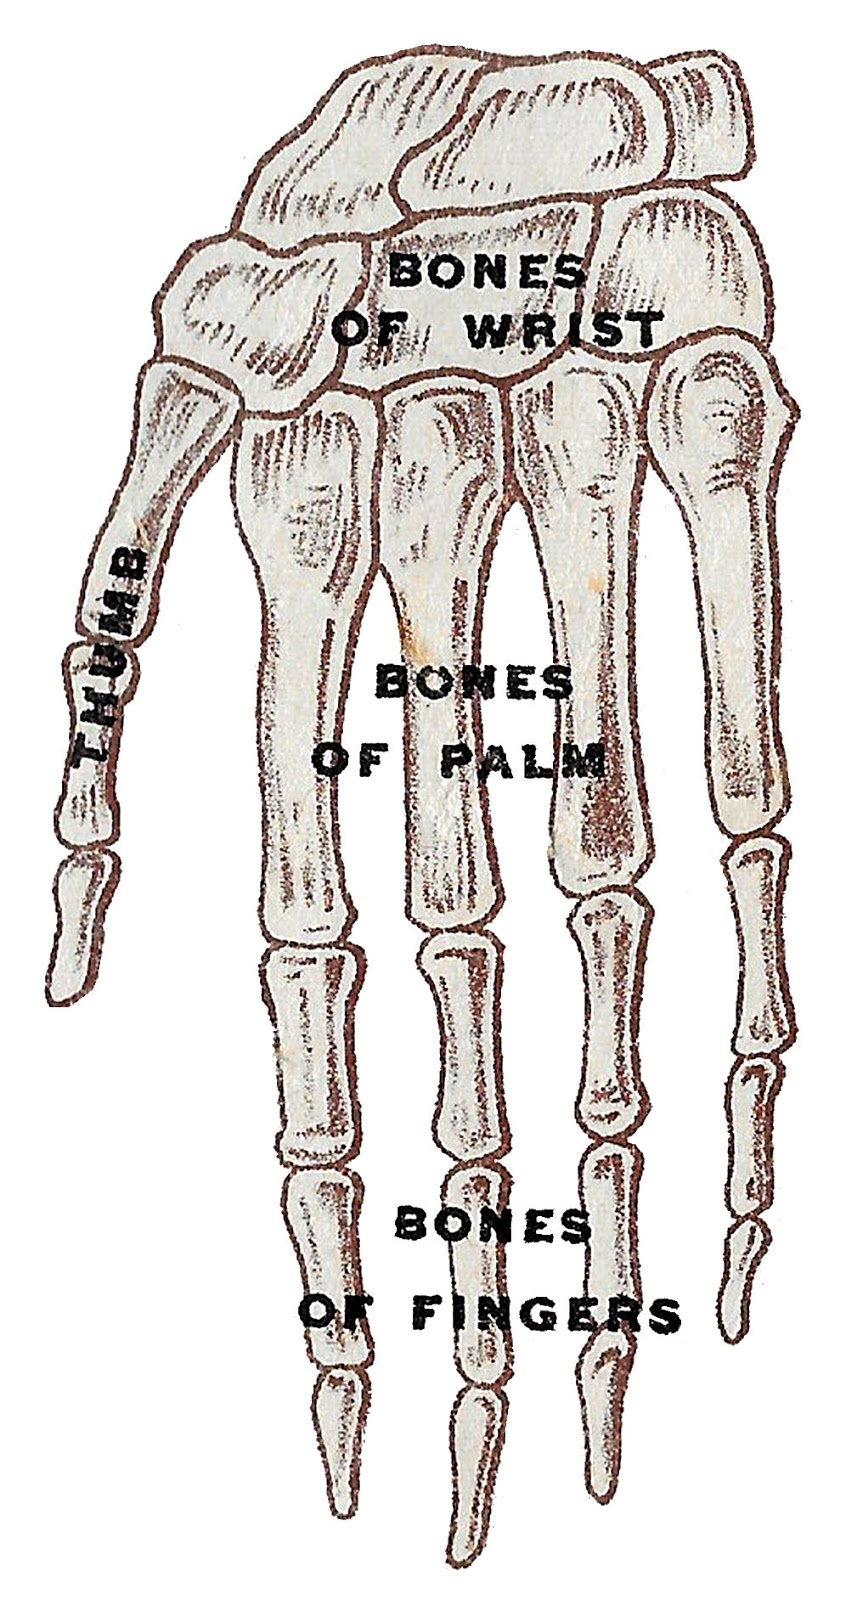 Antique Images Free Vintage Human Anatomy Illustration Images Eye